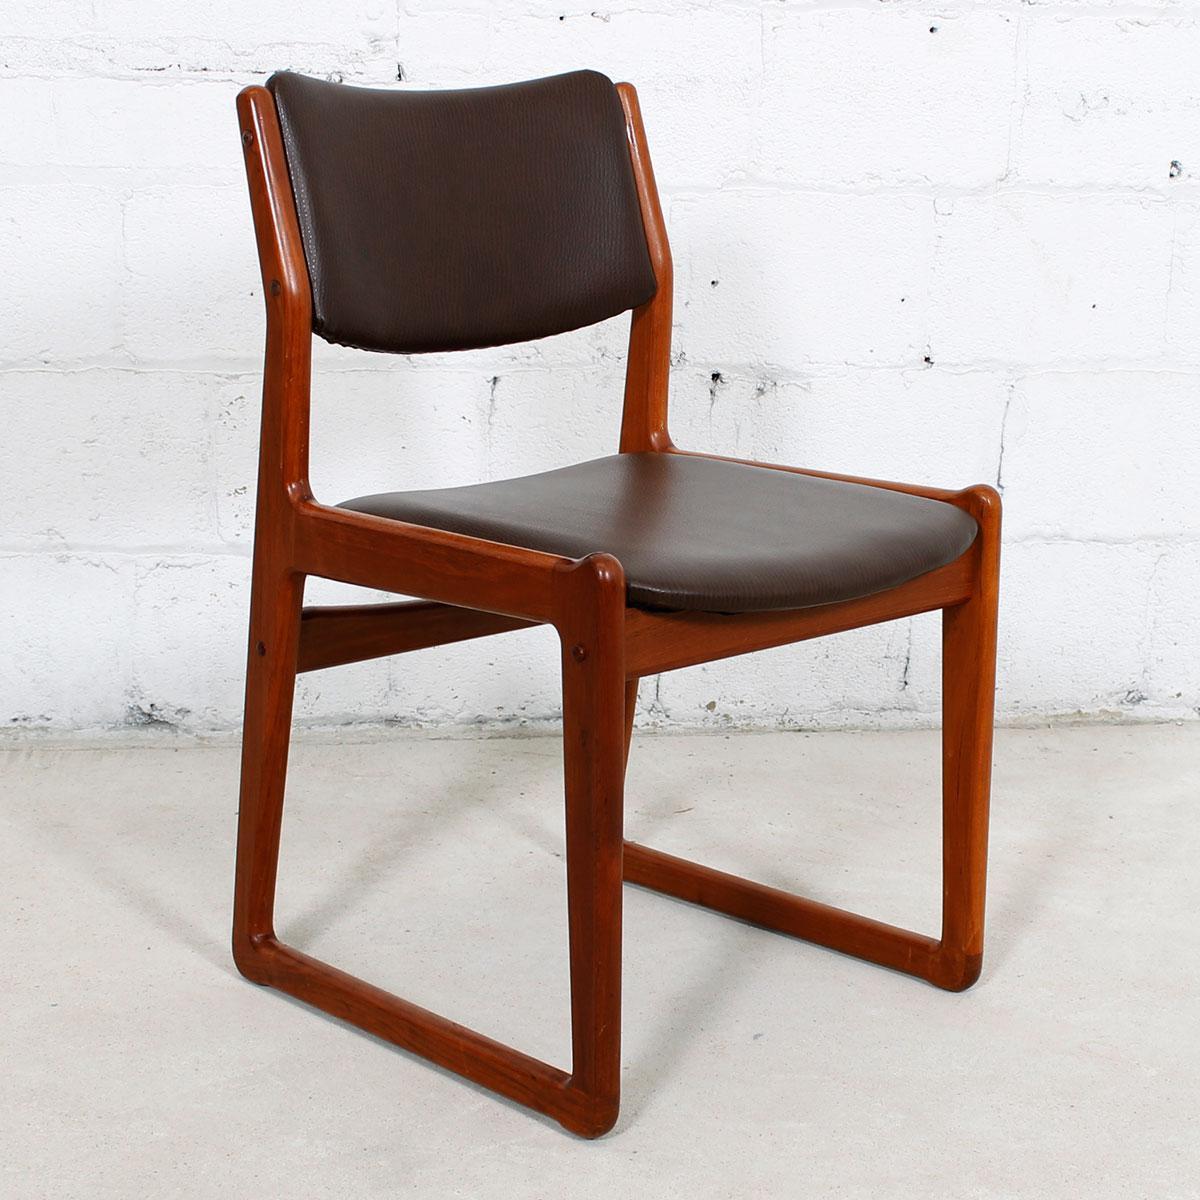 Set Of 4 Danish Teak Sleigh Leg Chairs In Teak With New Upholstery   Image 3